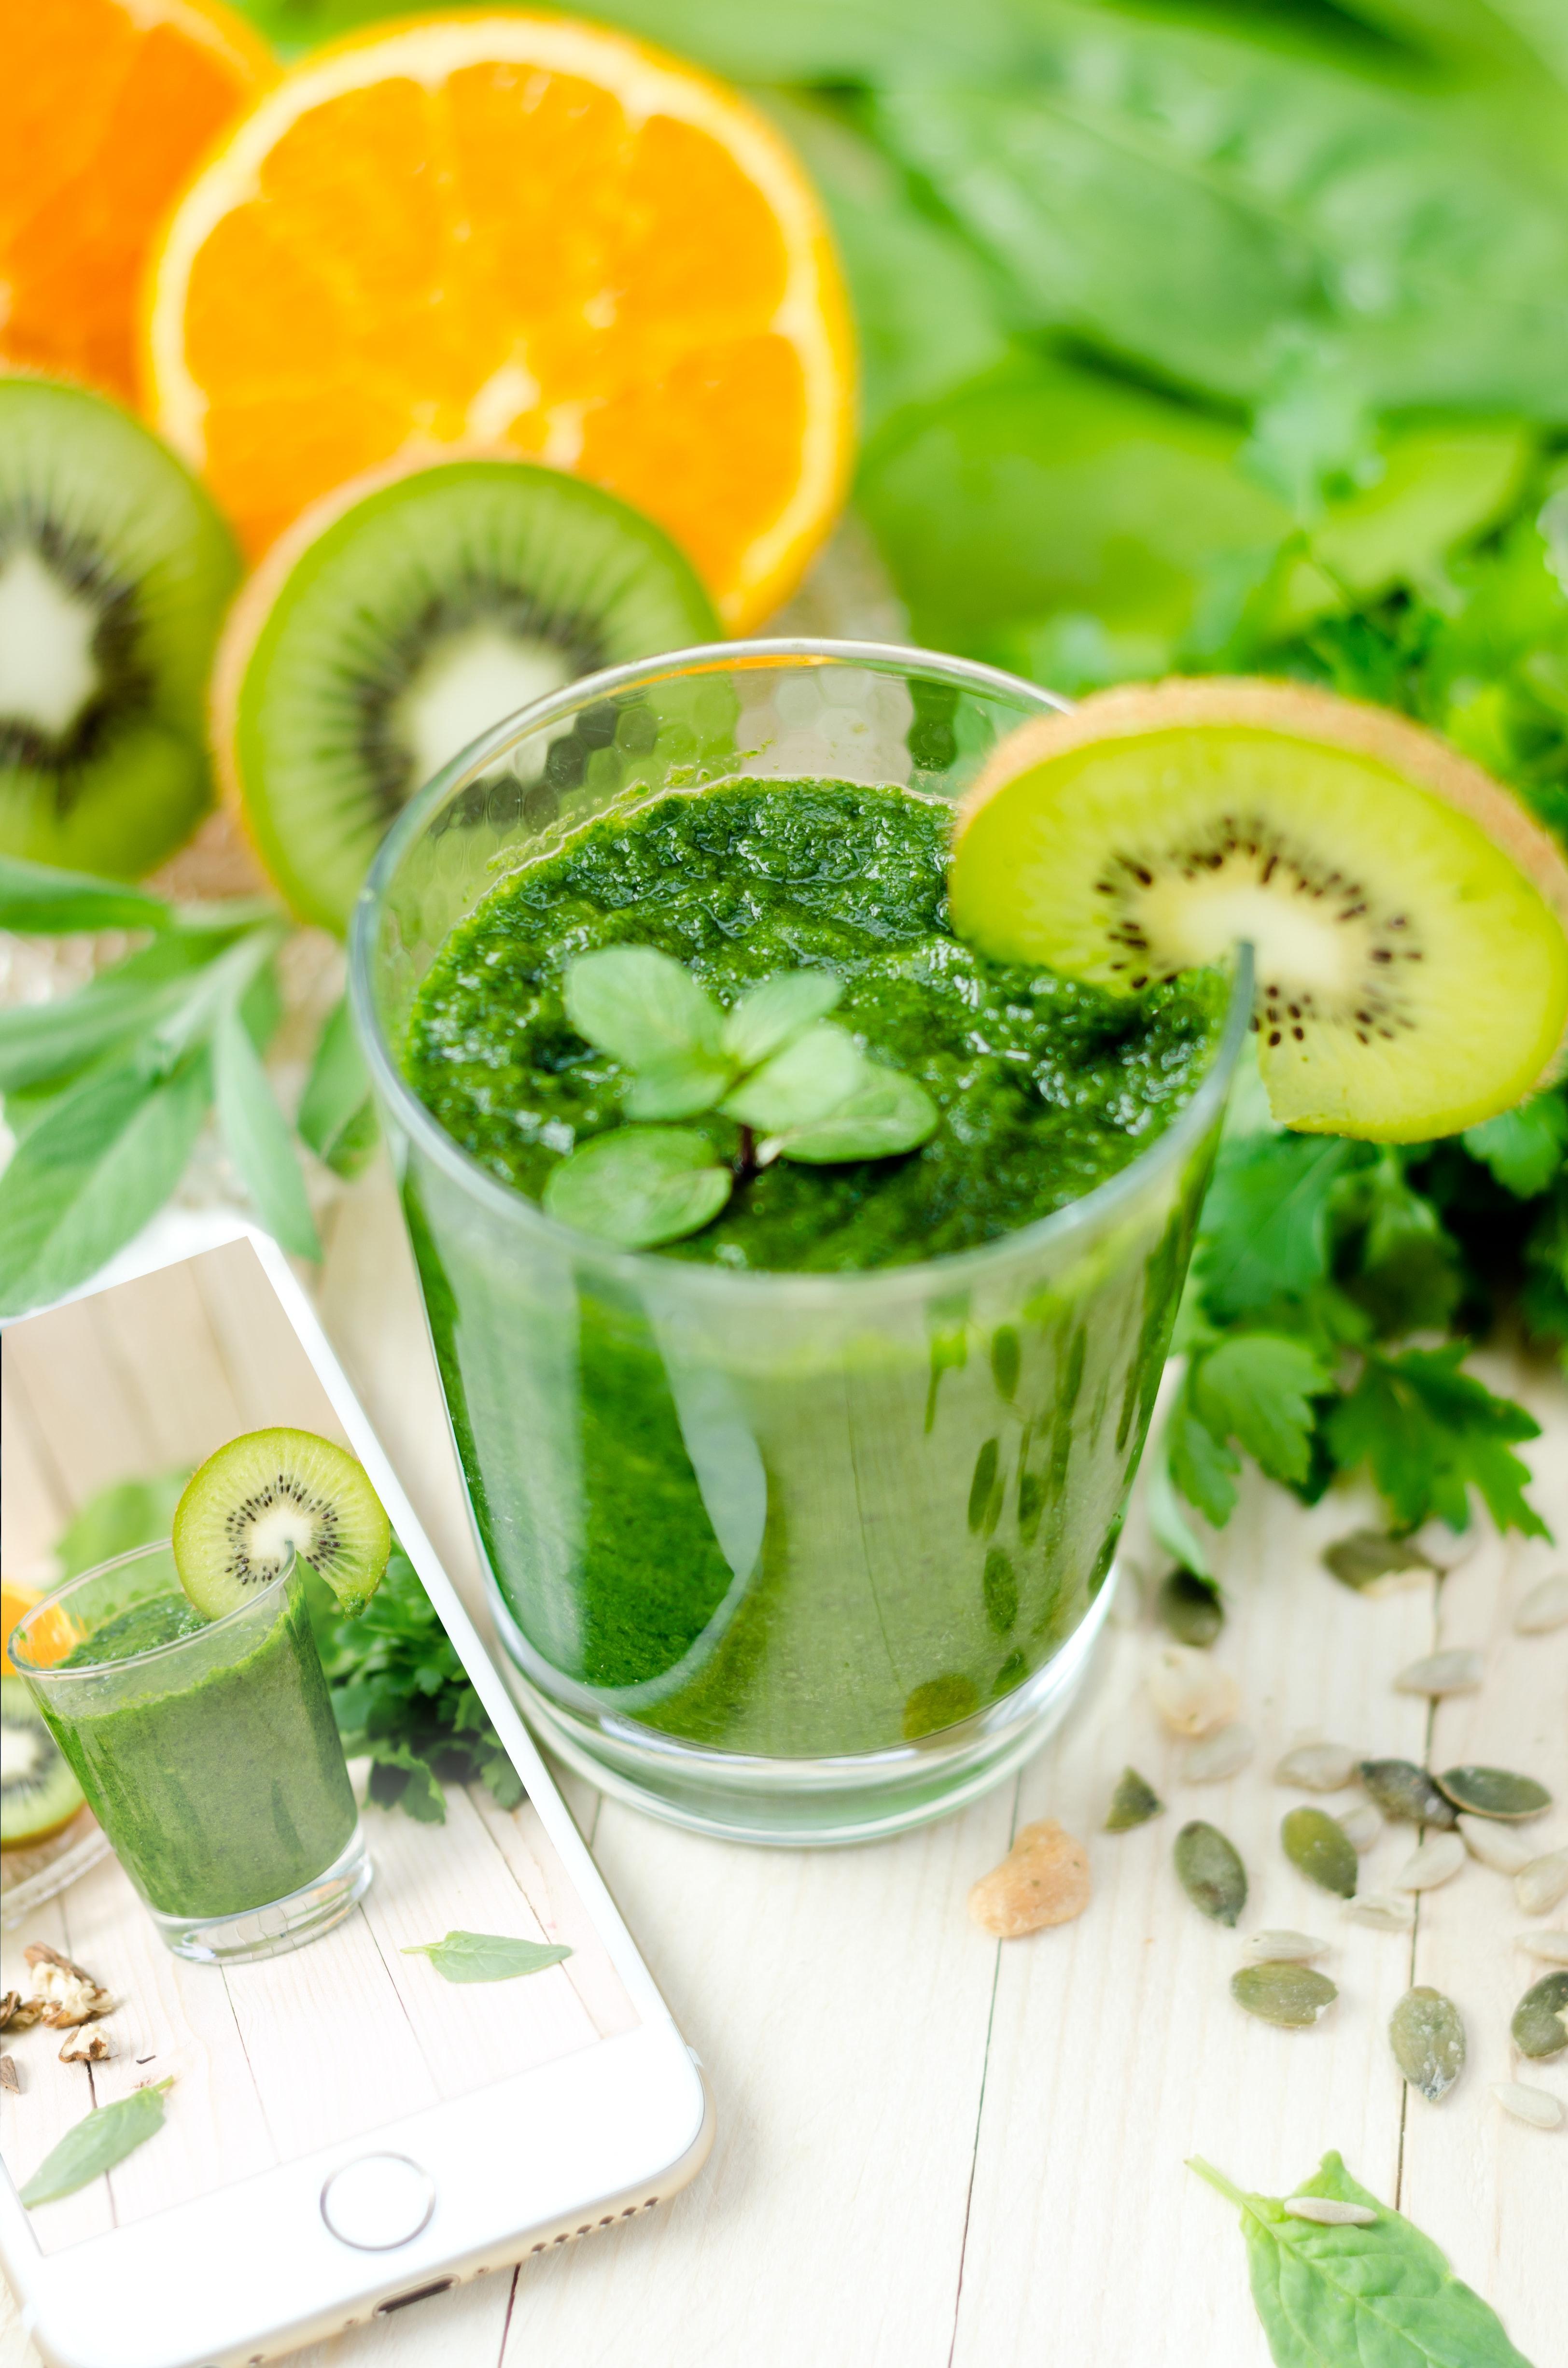 Green beverage for detoxification.